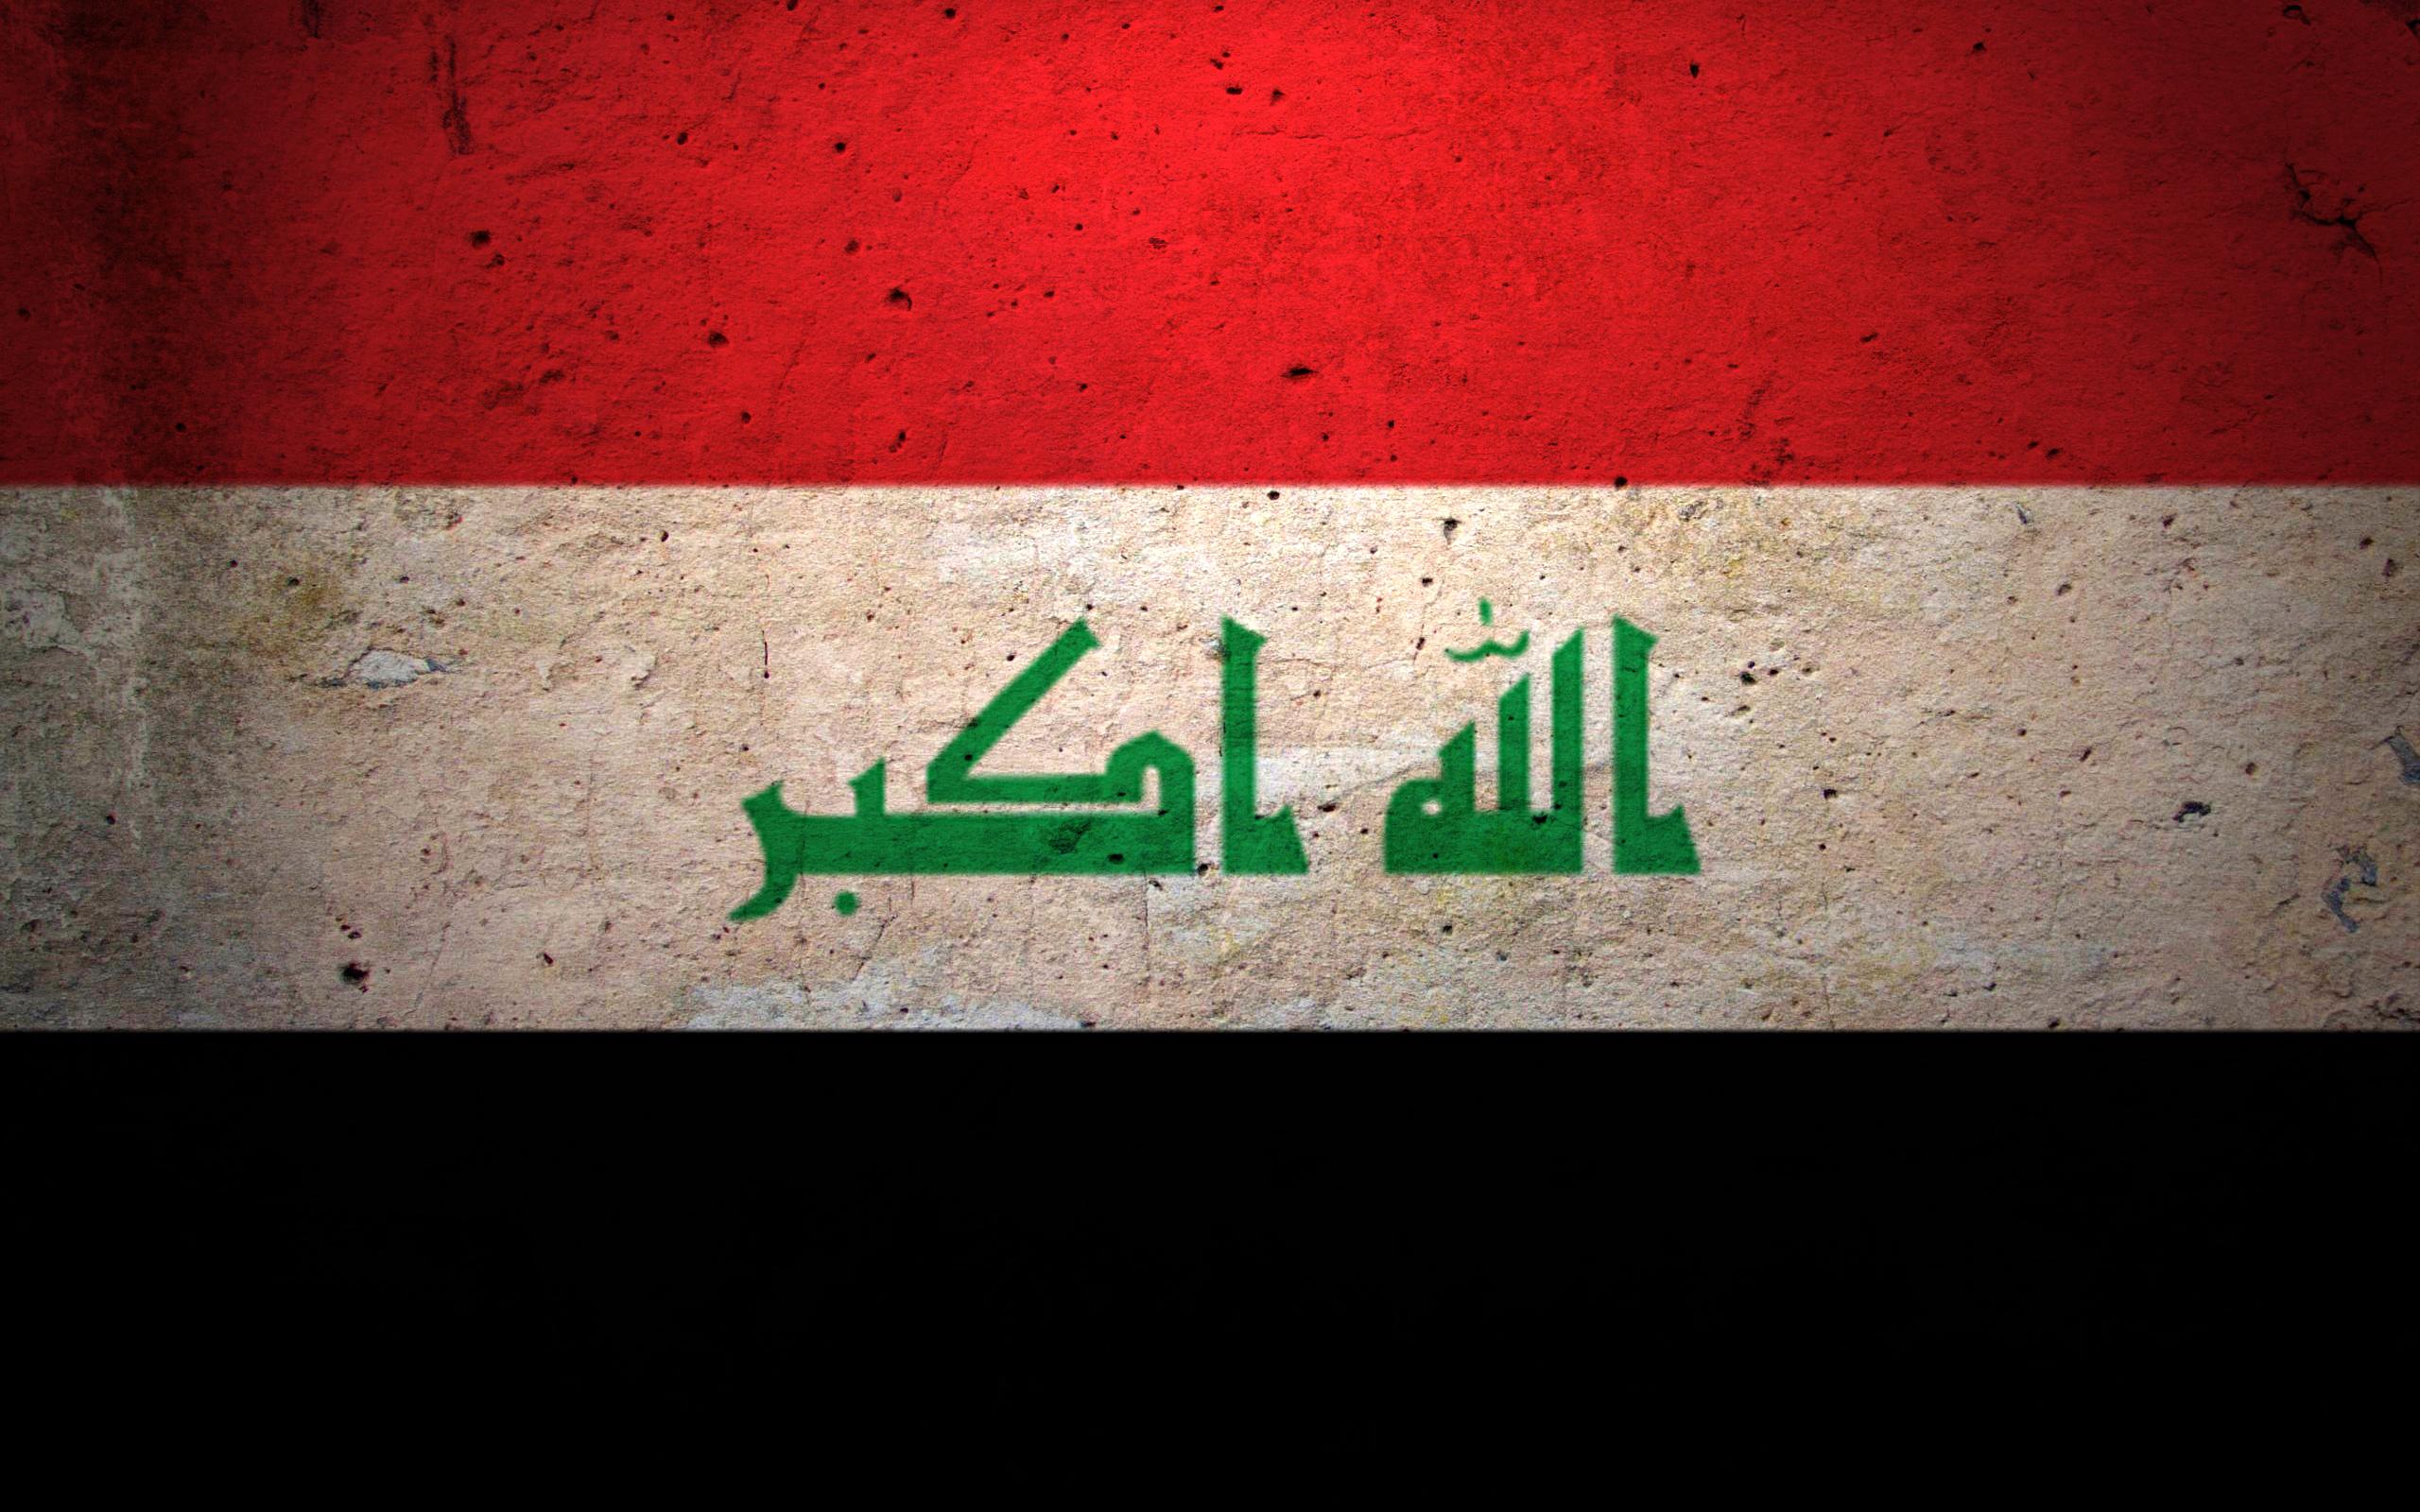 flags, Iraq - Free Wallpaper / WallpaperJam.com